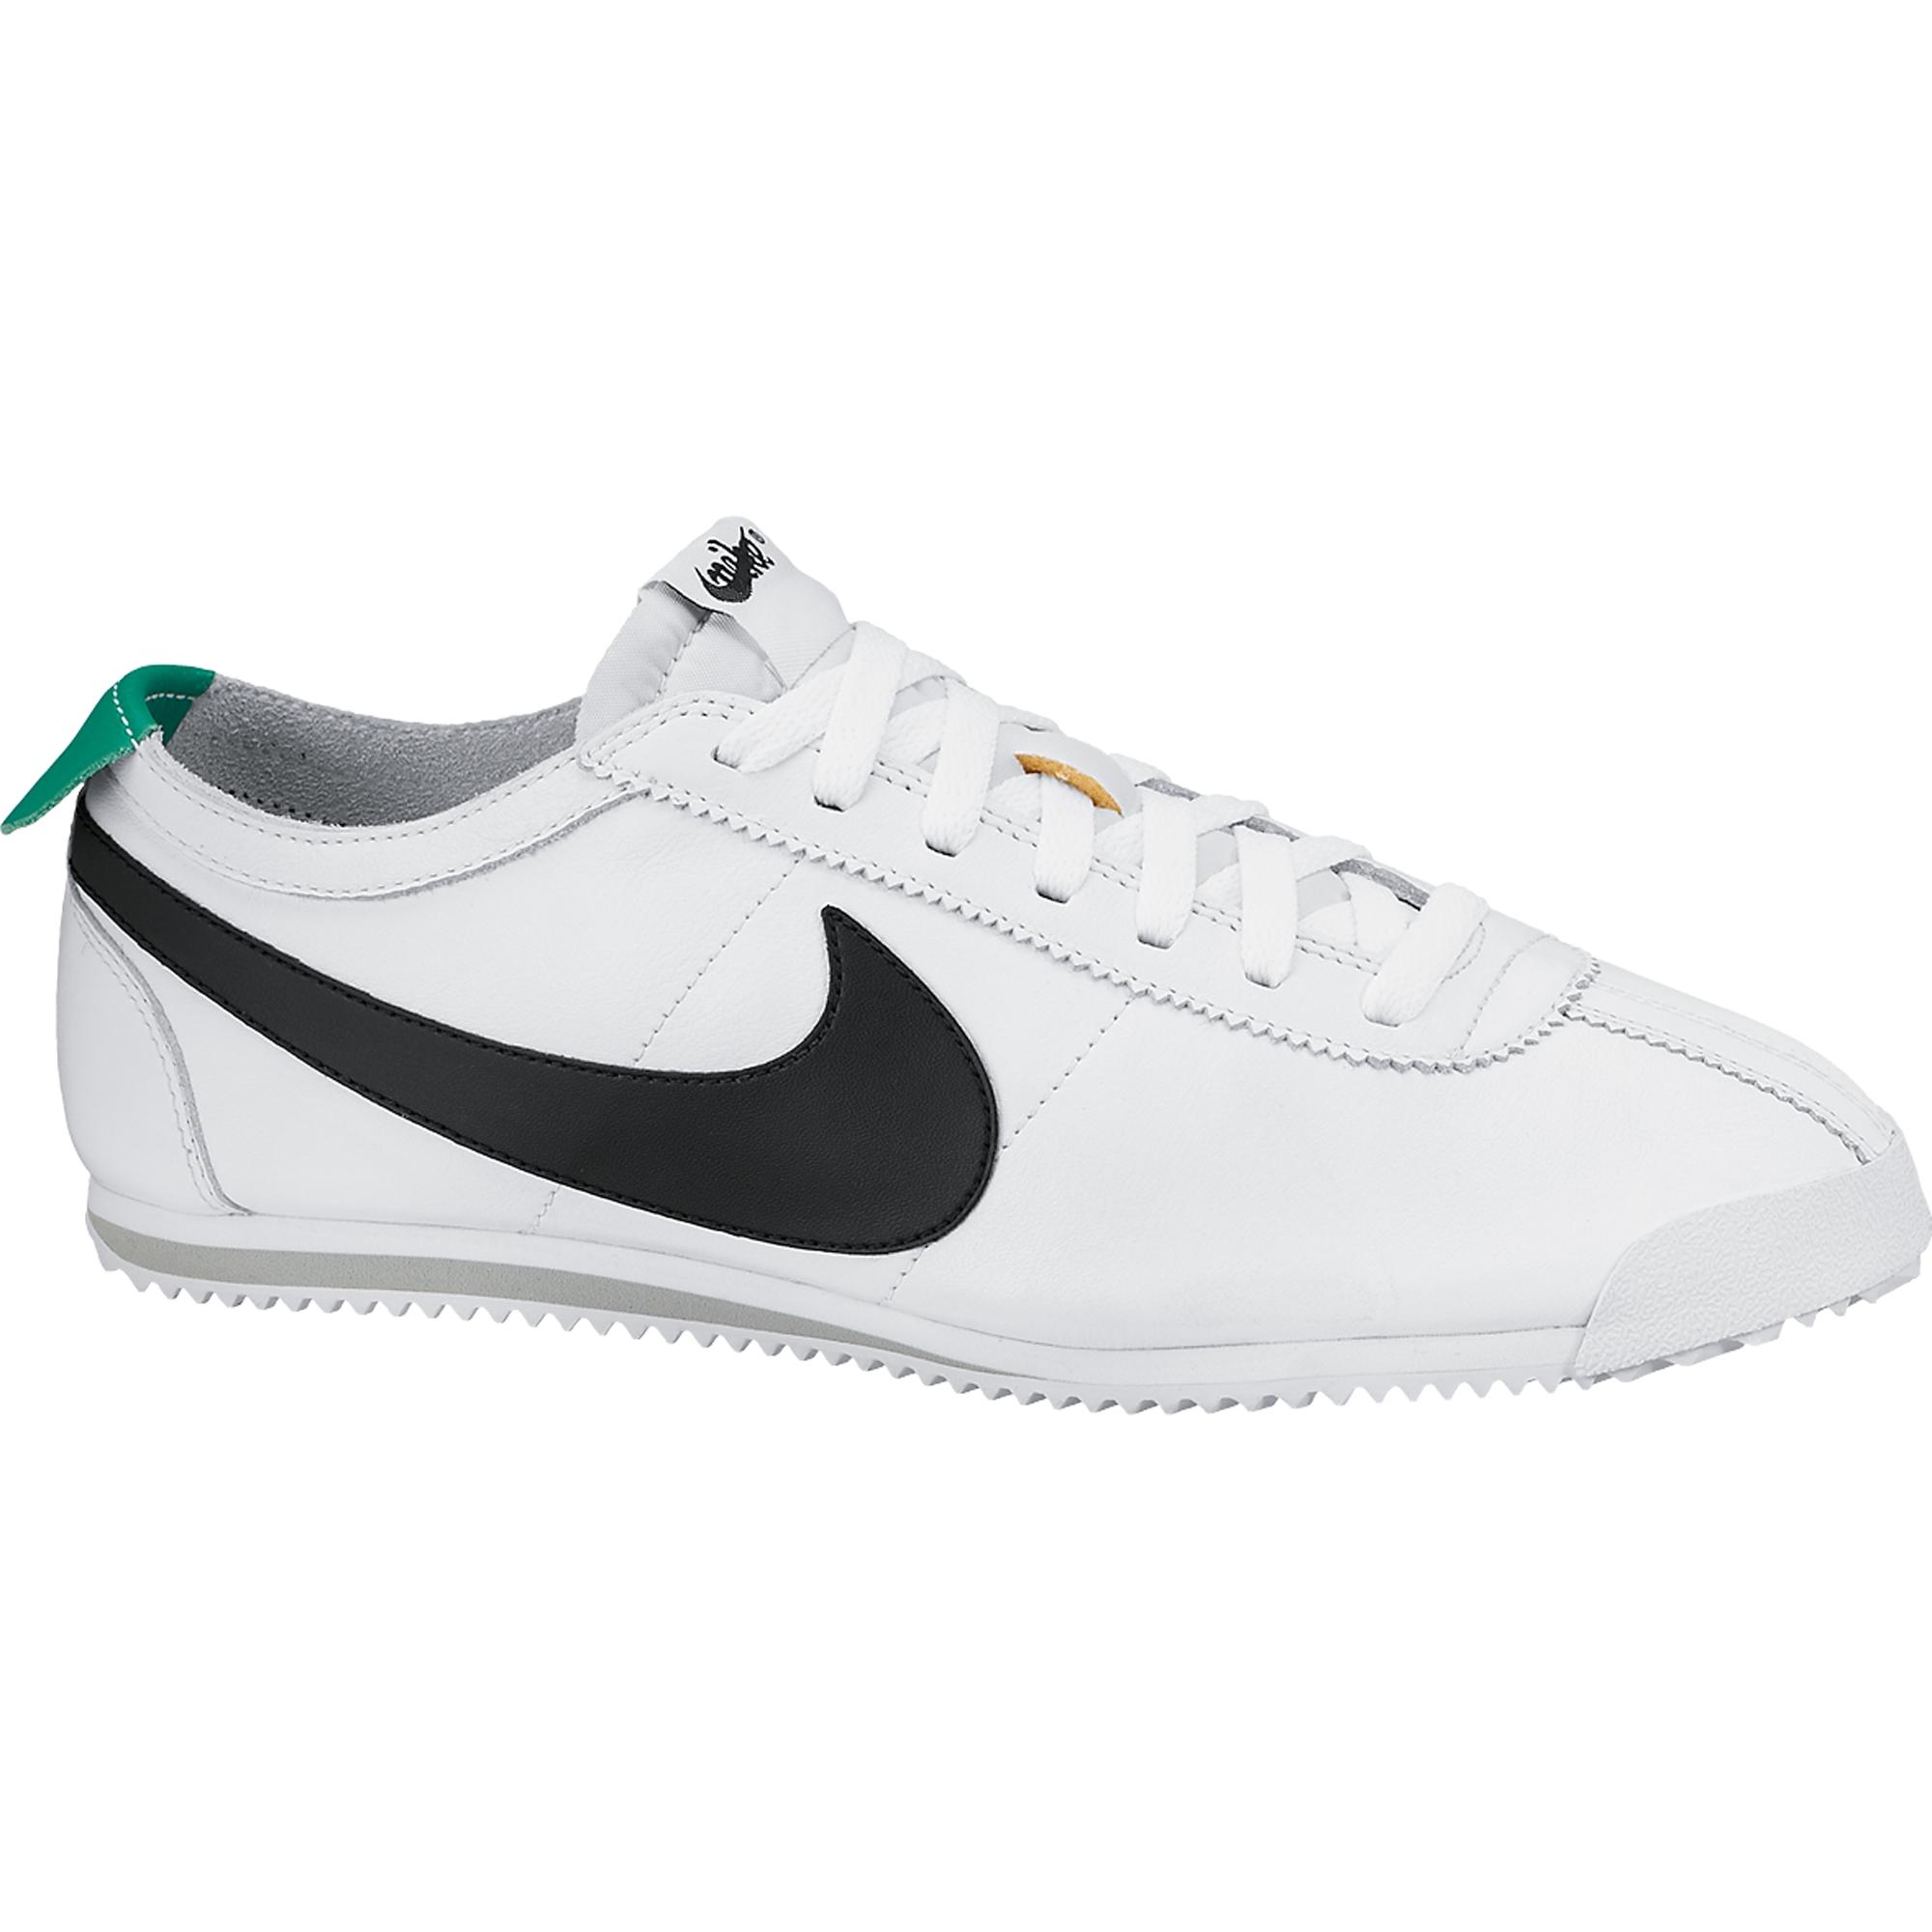 Nike Cortez Classic Ognike Cortez Classic Og Leather